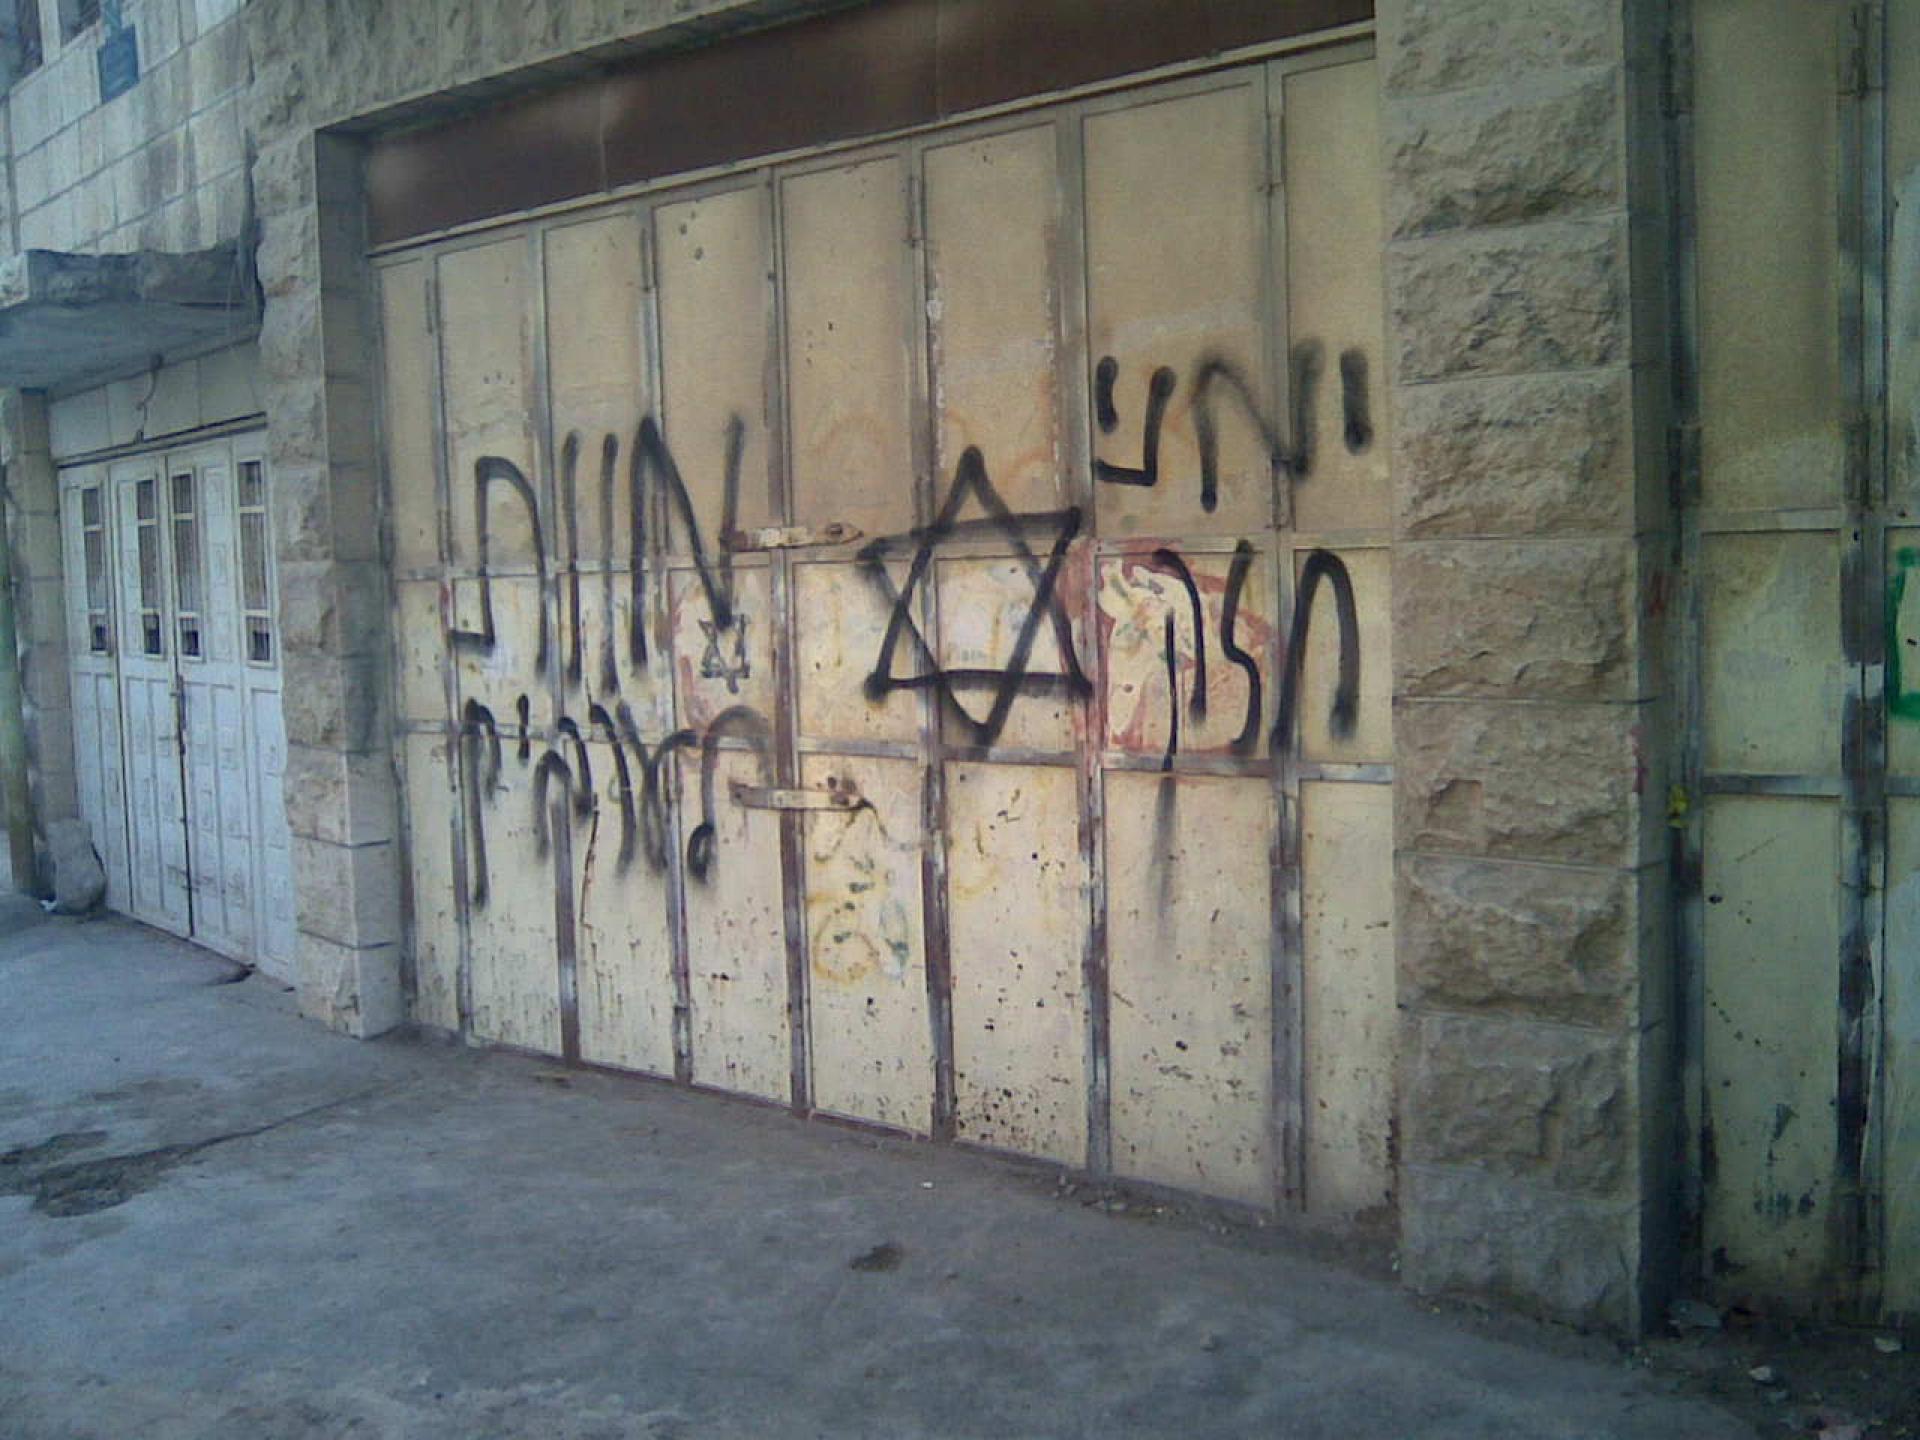 Hebron 27.11.11